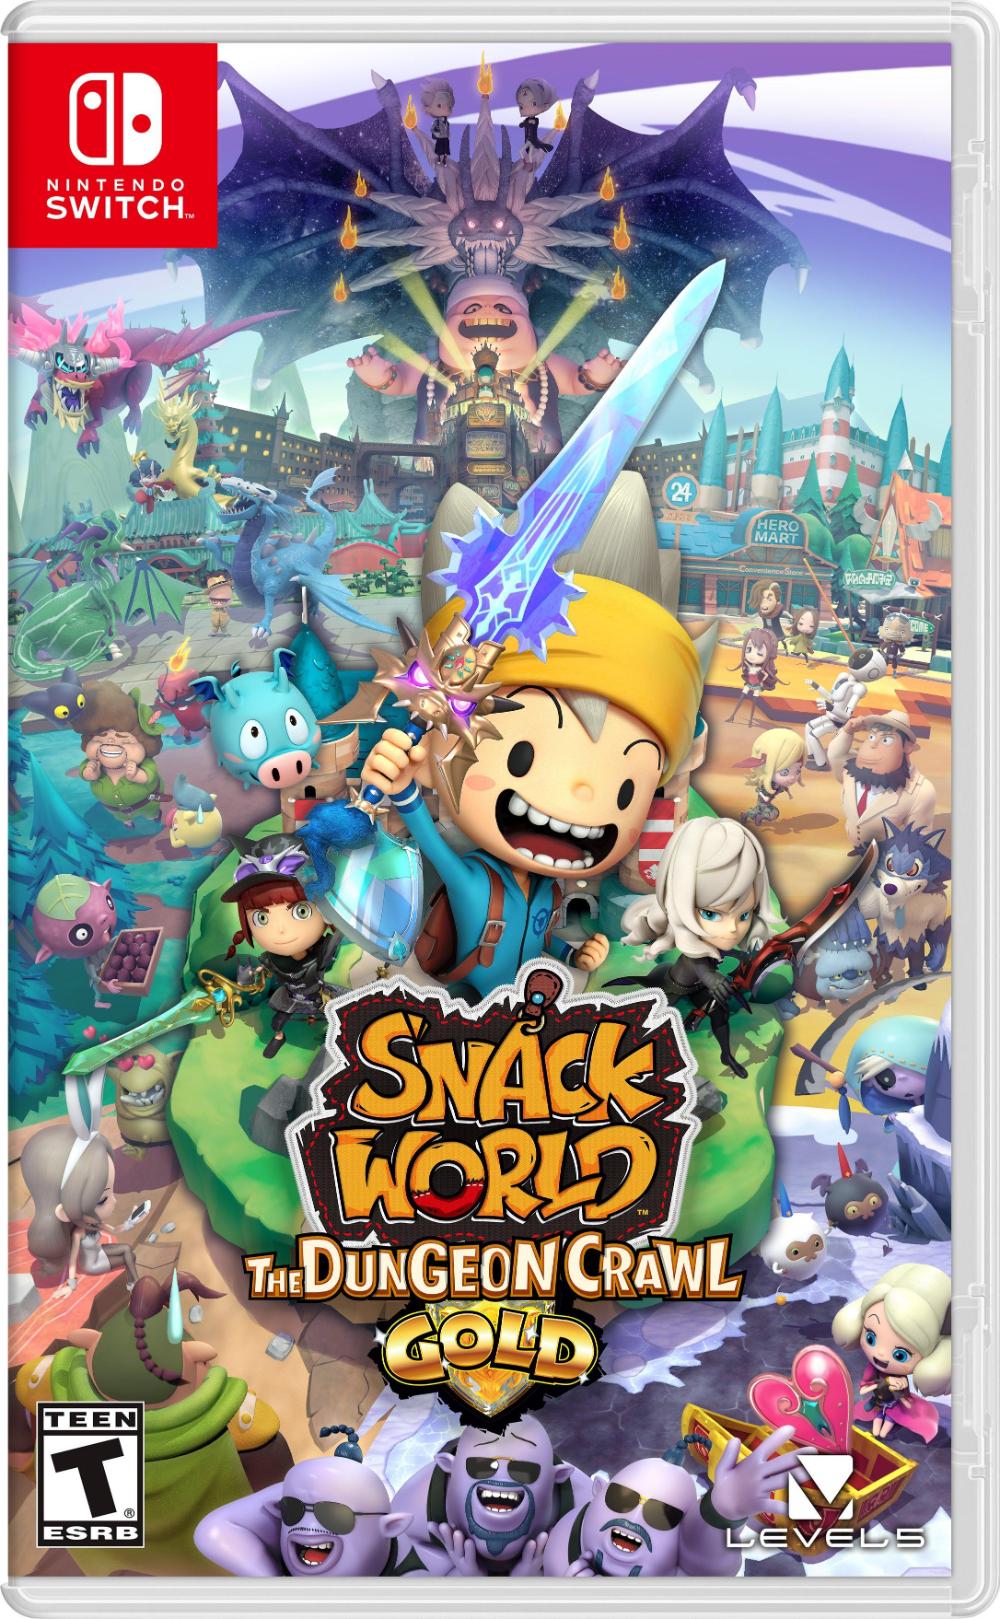 Snack World The Dungeon Crawl Gold Nintendo Switch Gamestop In 2020 Nintendo Switch Games Nintendo Switch Nintendo